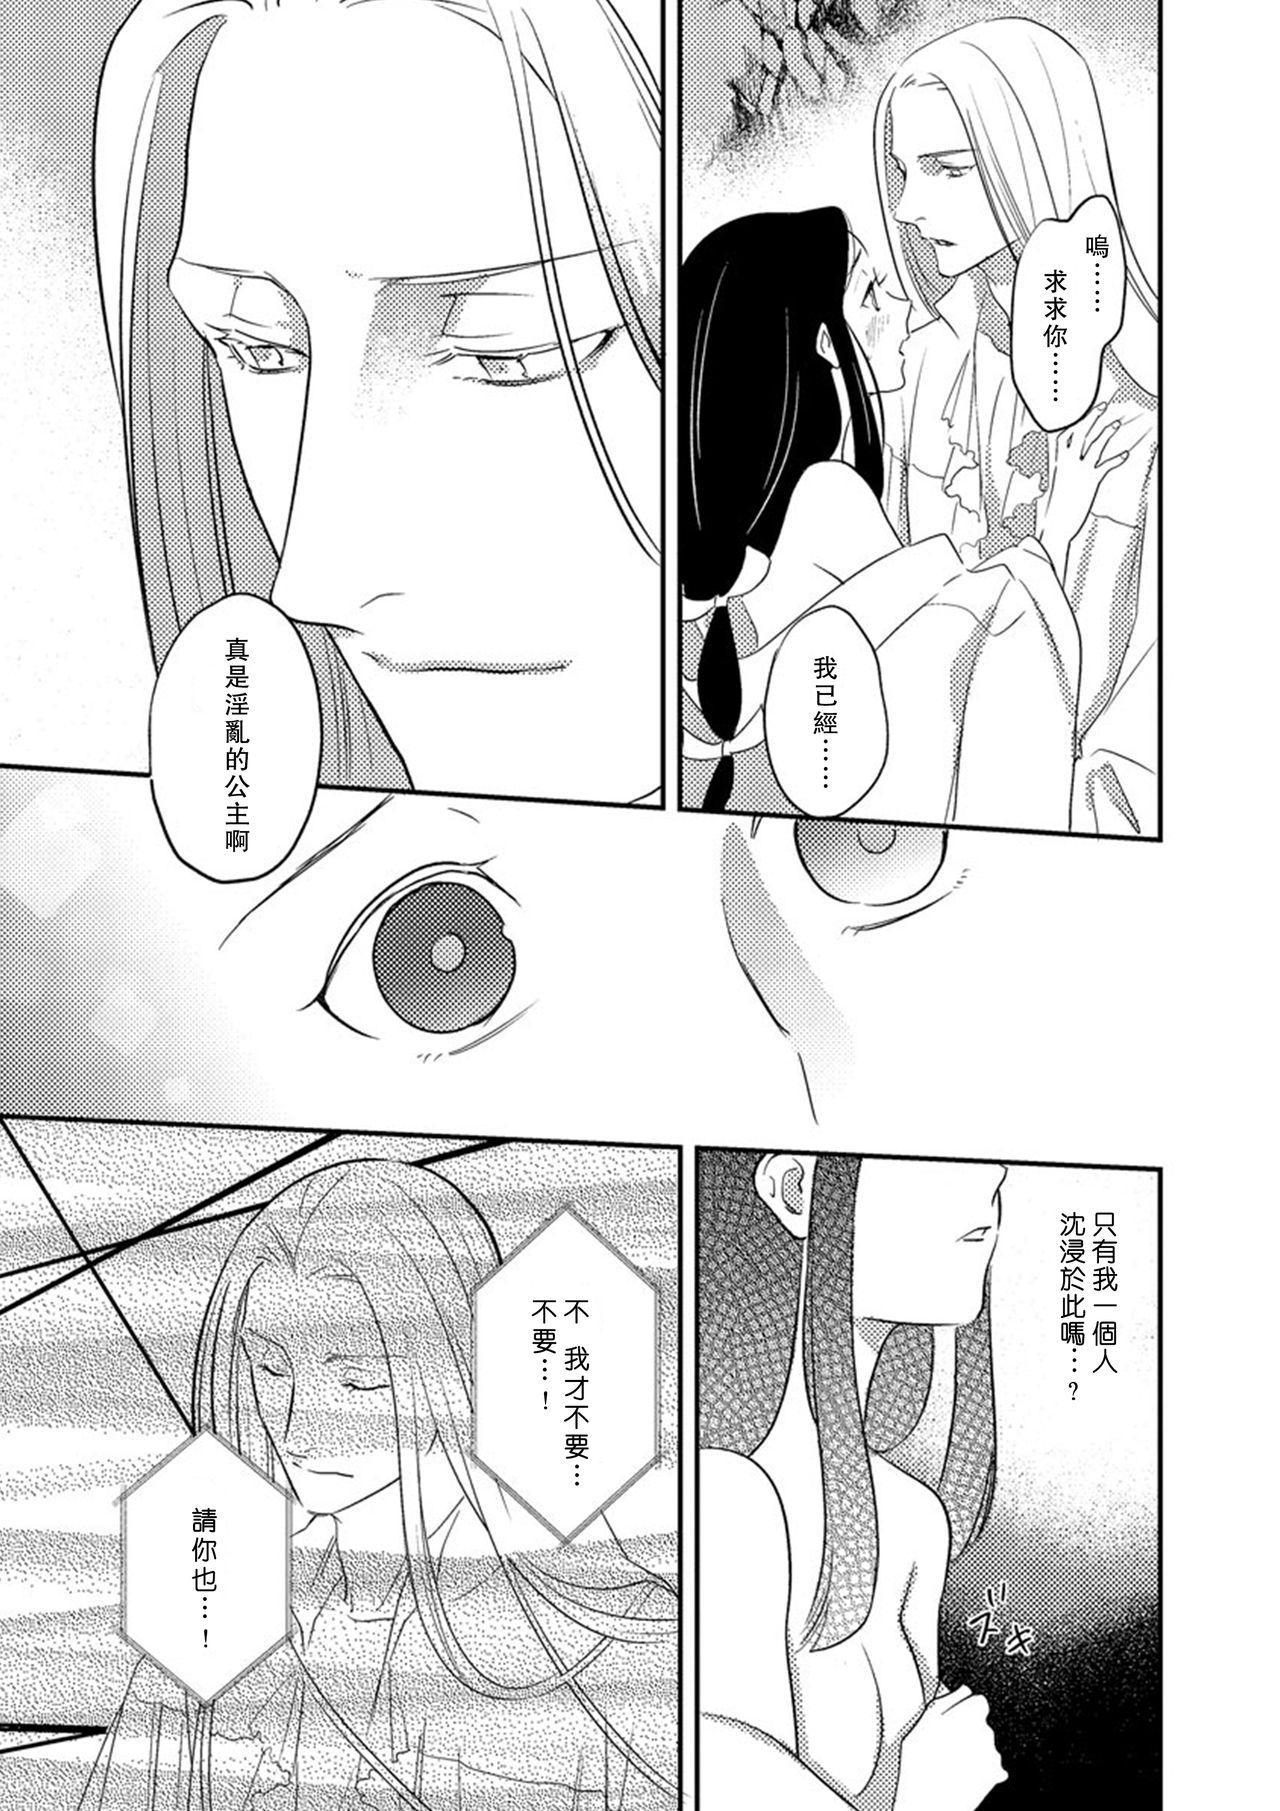 Oeyama suimutan utsukushiki oni no toraware hime | 大江山醉夢逸話 美麗的鬼與被囚禁的公主 Ch. 1-8 100